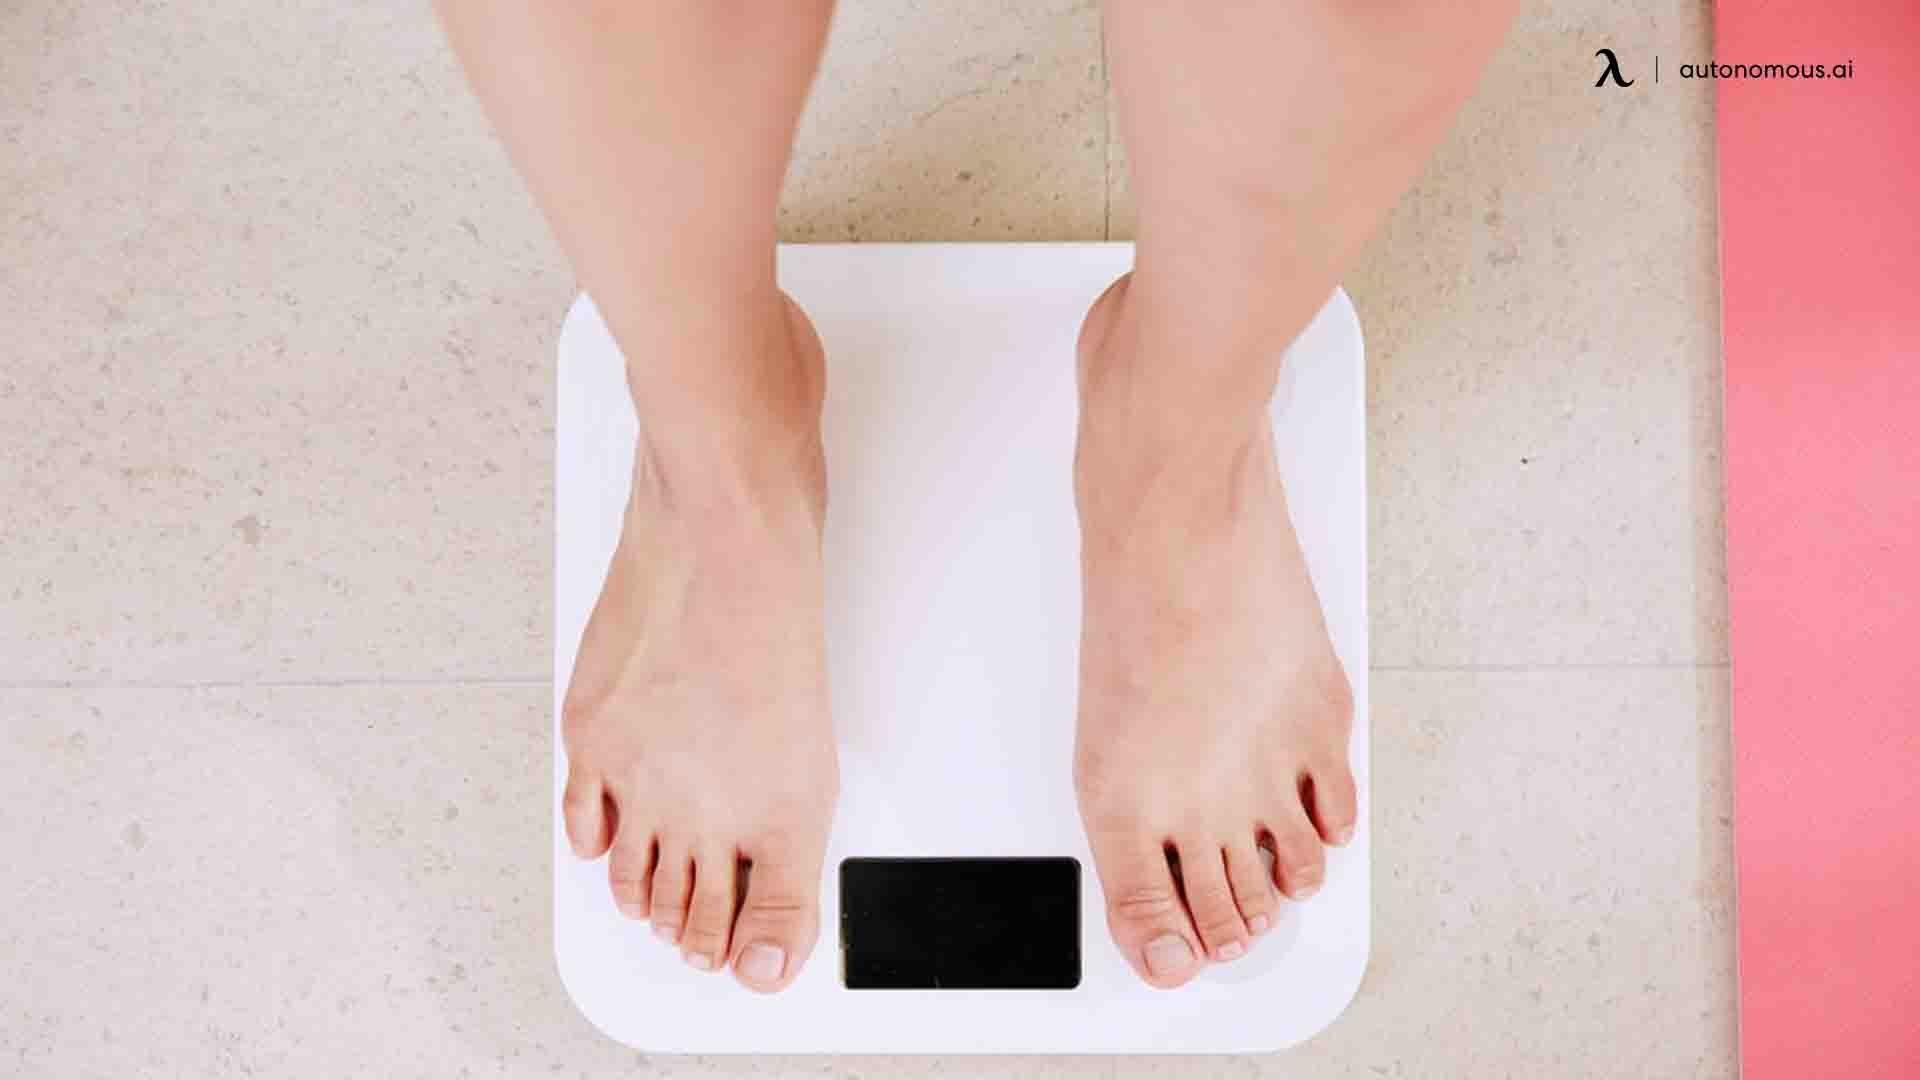 Lower weight gain